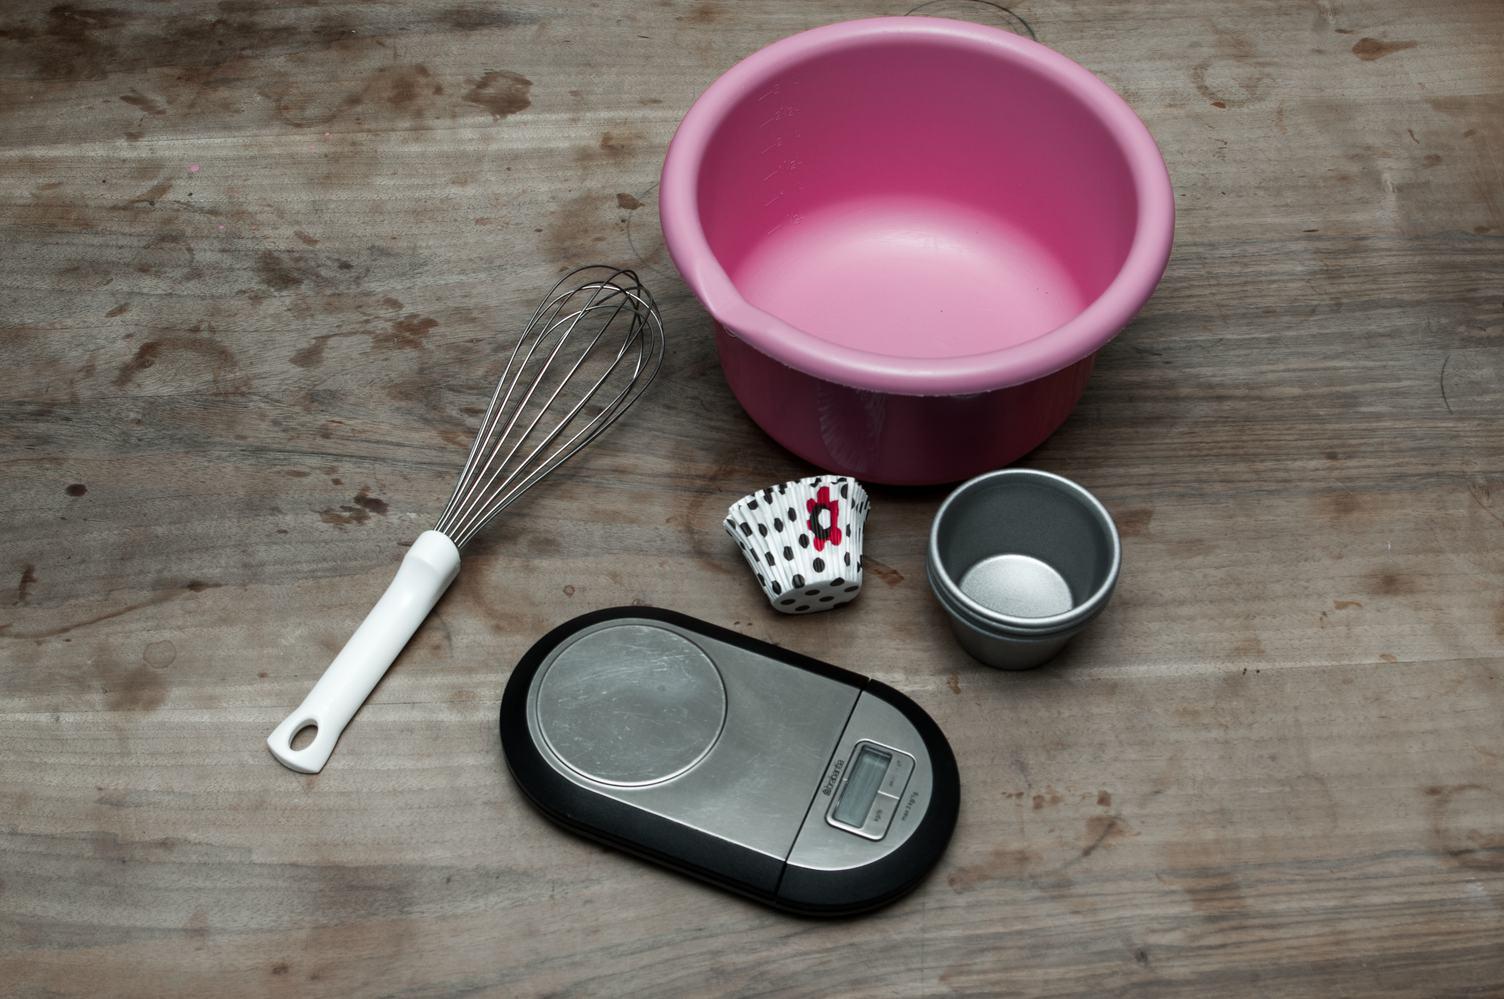 Homemade Baking - Cupcakes Preparation